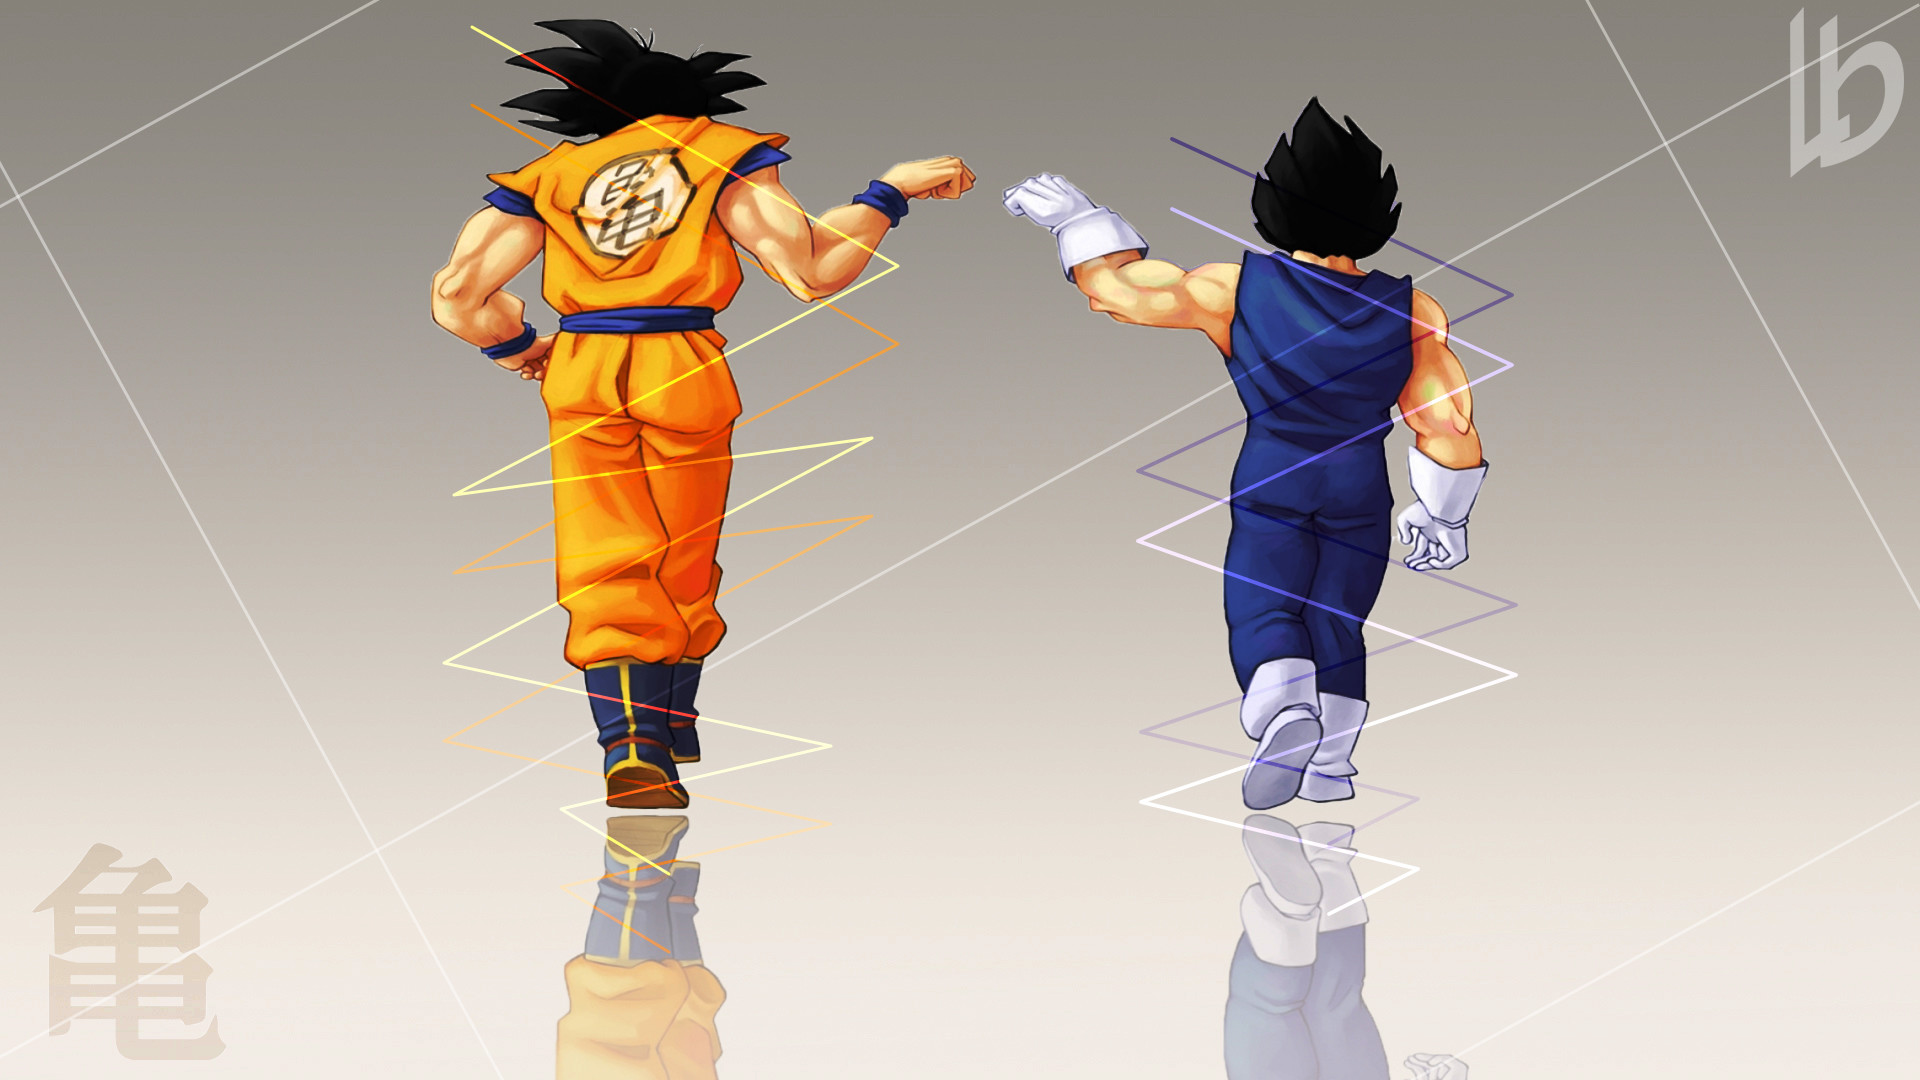 Anime – Dragon Ball Z Goku Vegeta (Dragon Ball) Wallpaper